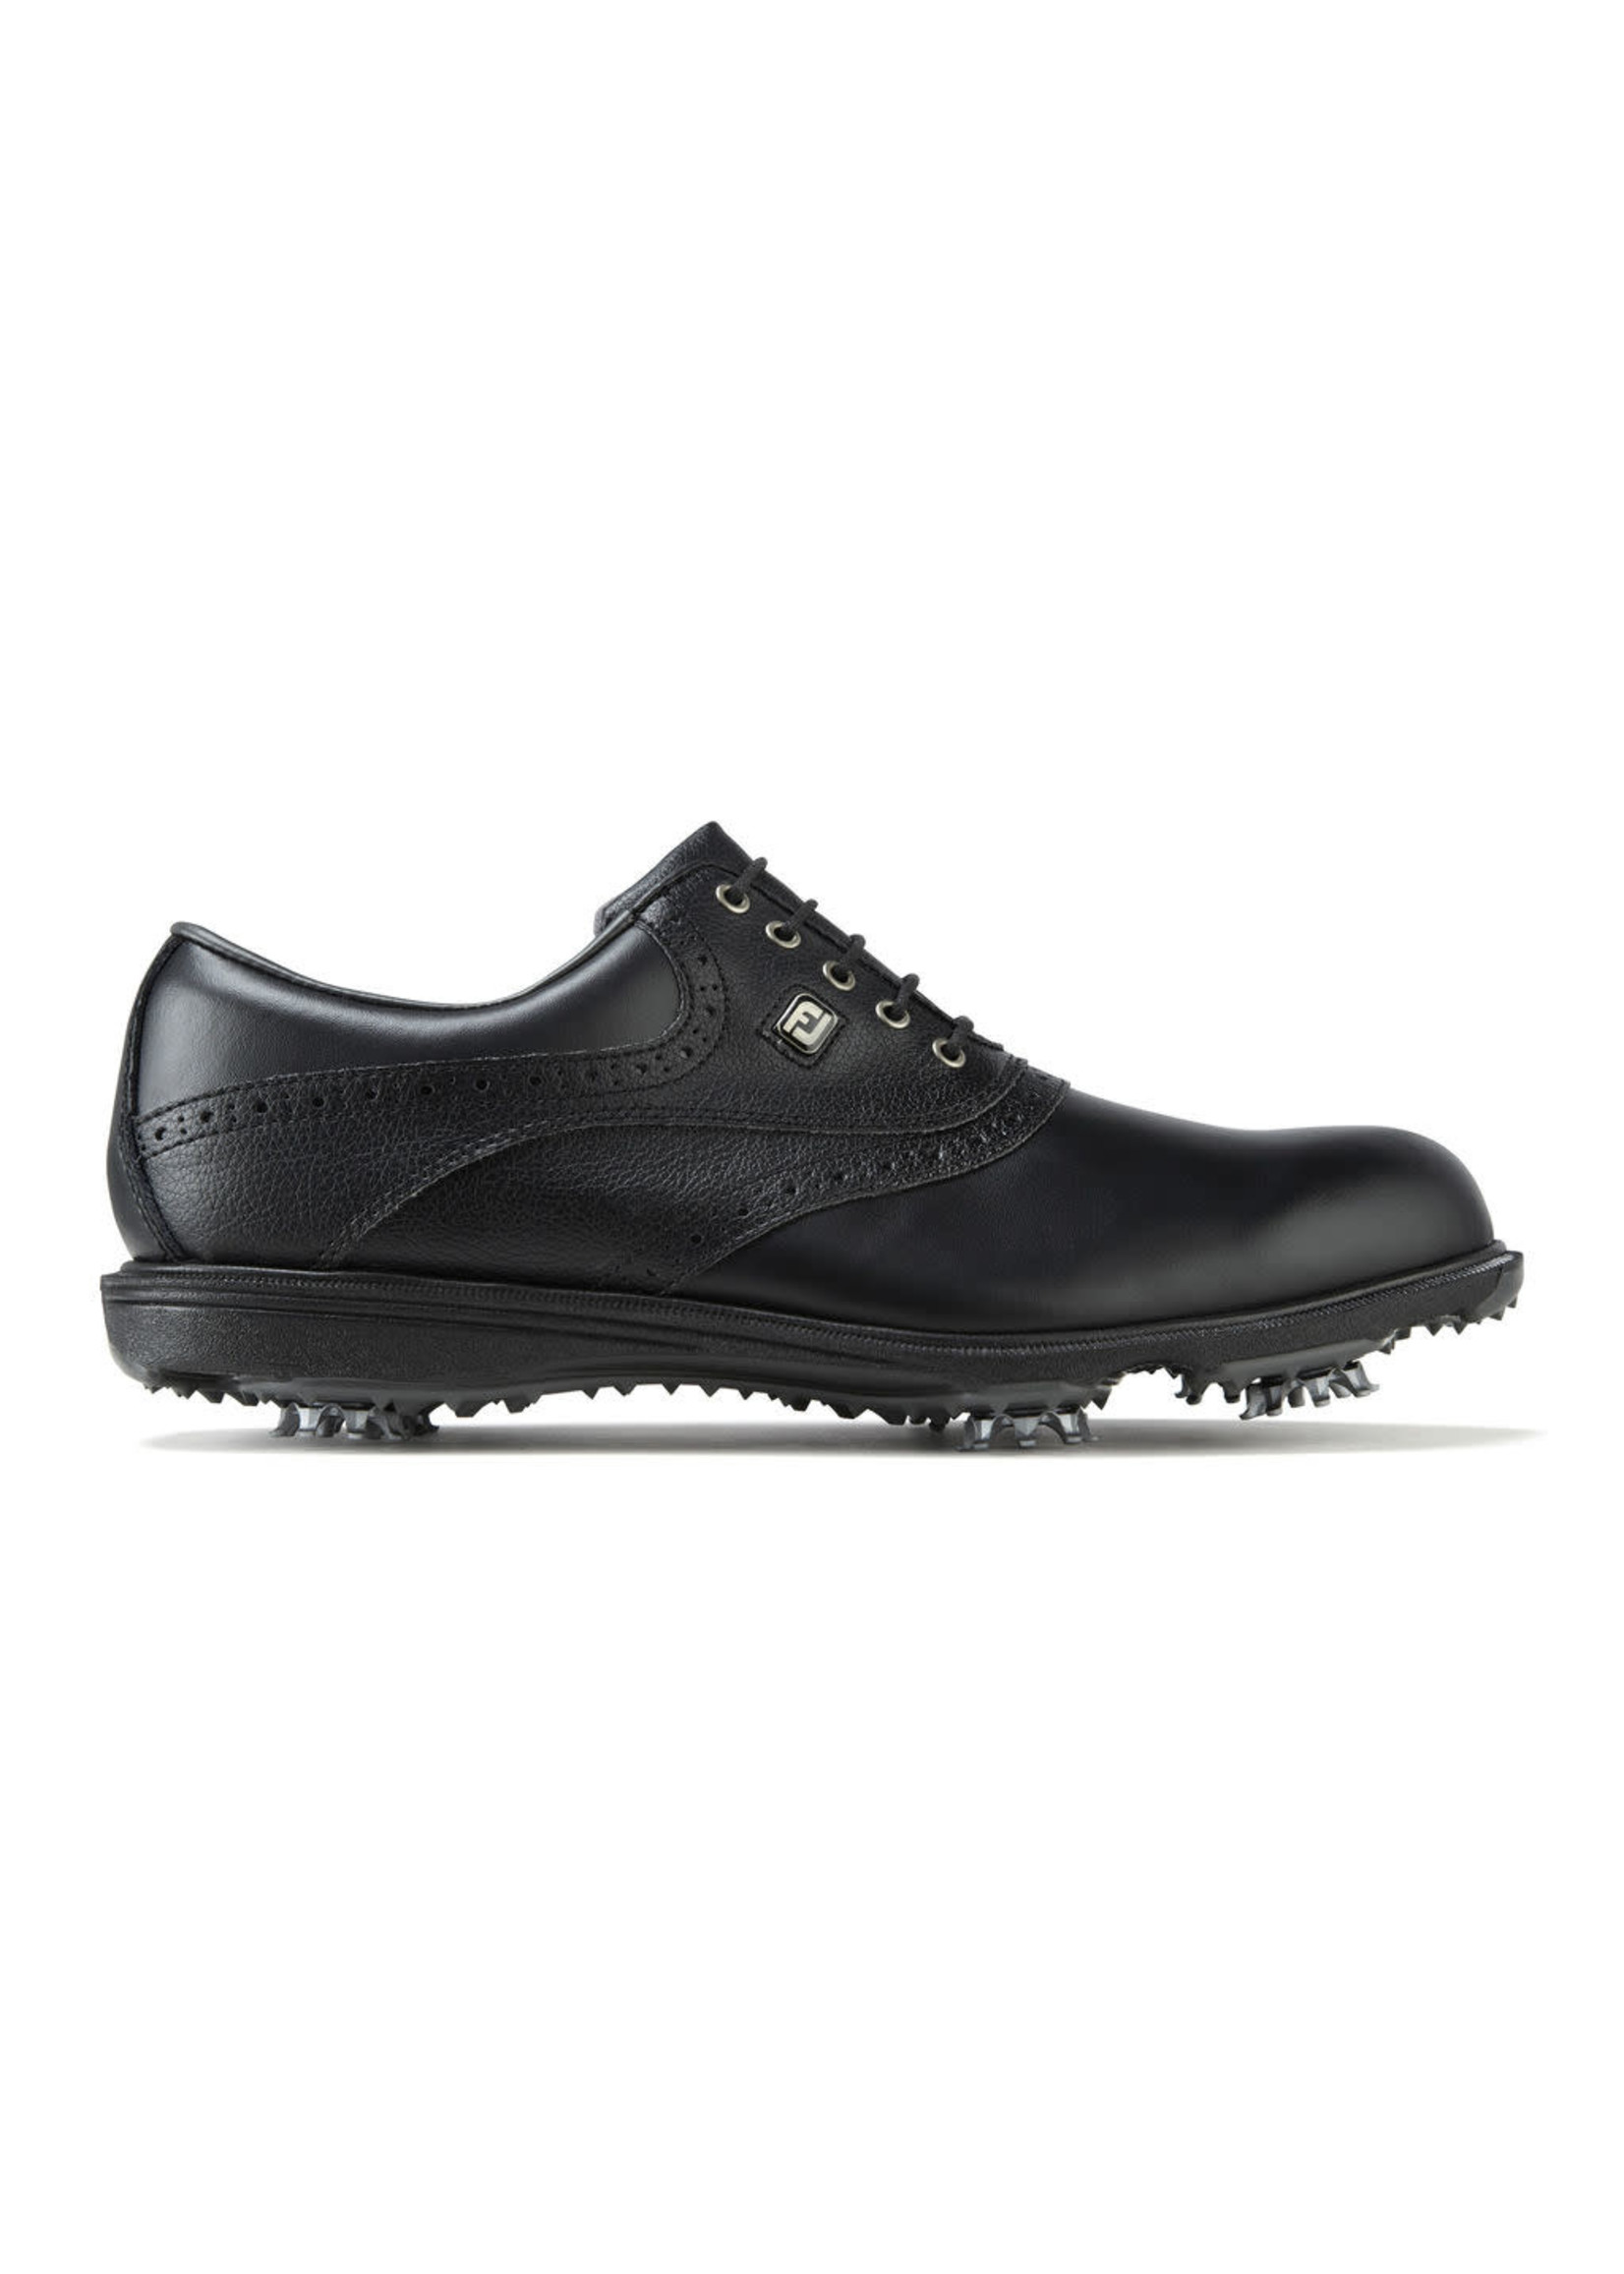 Footjoy Footjoy Hydrolite 2.0 Mens Golf Shoe (2019)